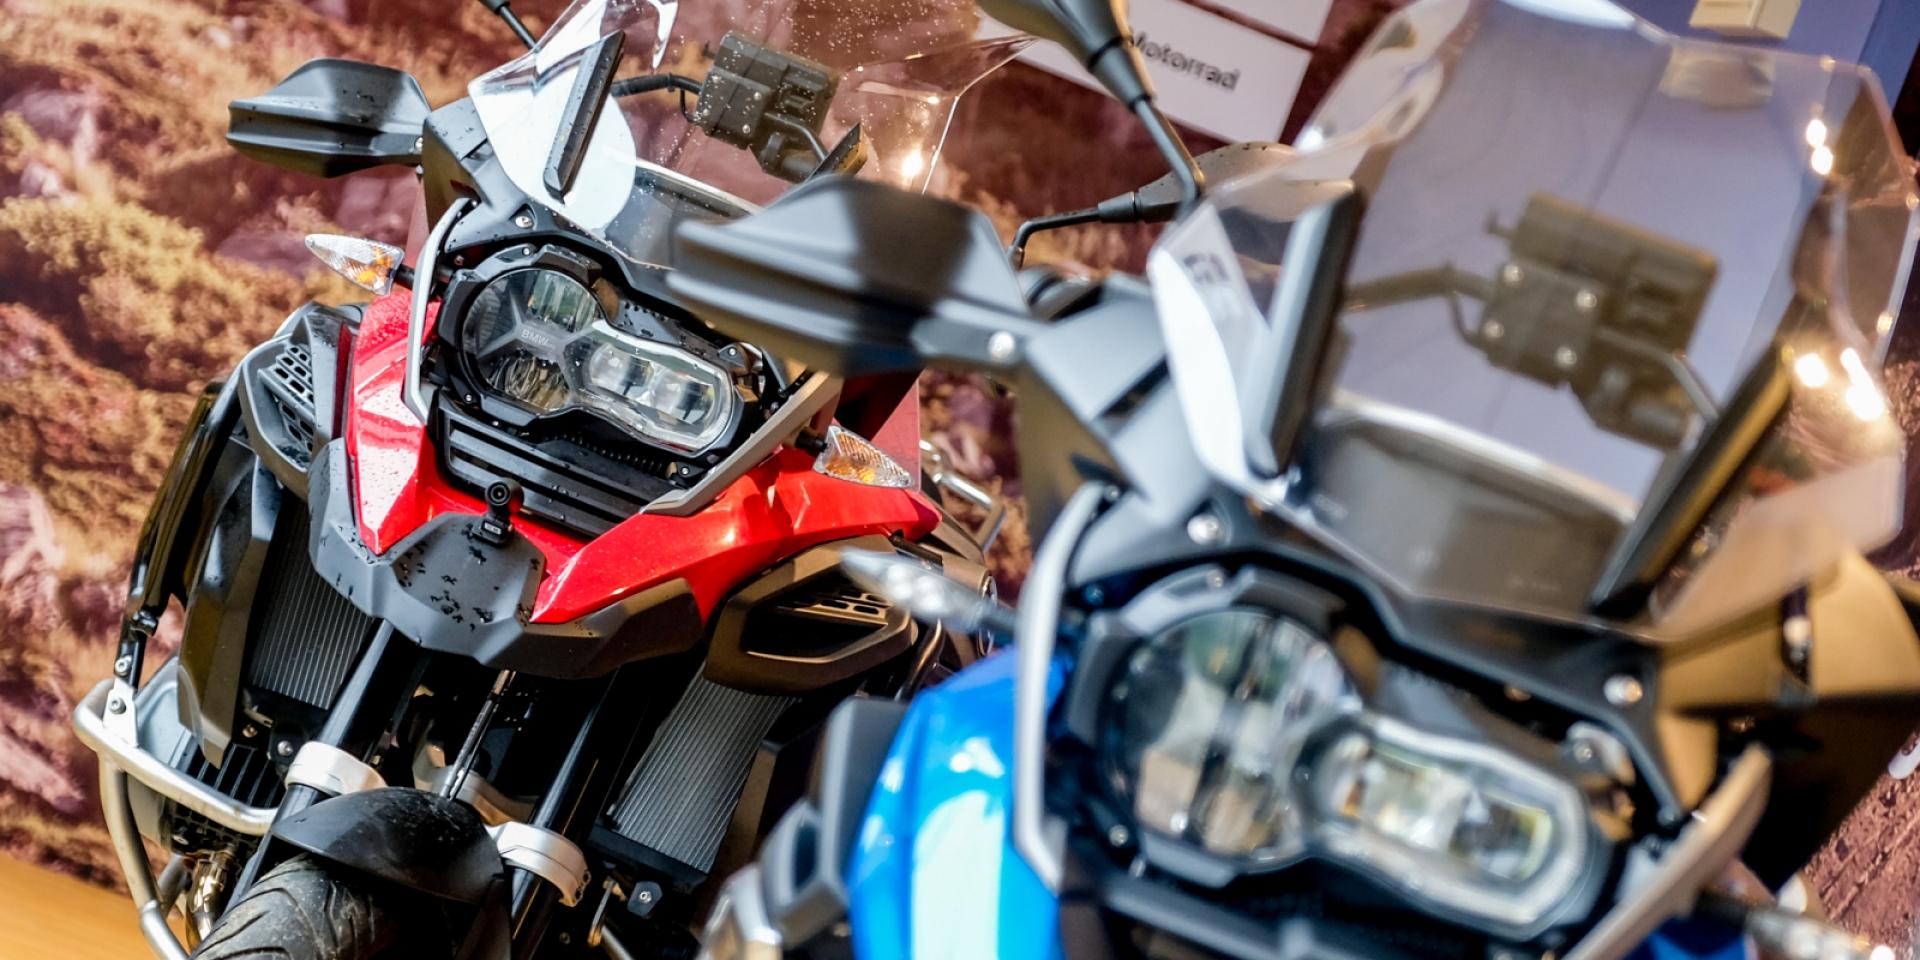 ShiftCam技術導入 馬力扭力雙提升,BMW R 1250 GS/ R 1250 GS Adventure/ R 1250 RT上市發表會